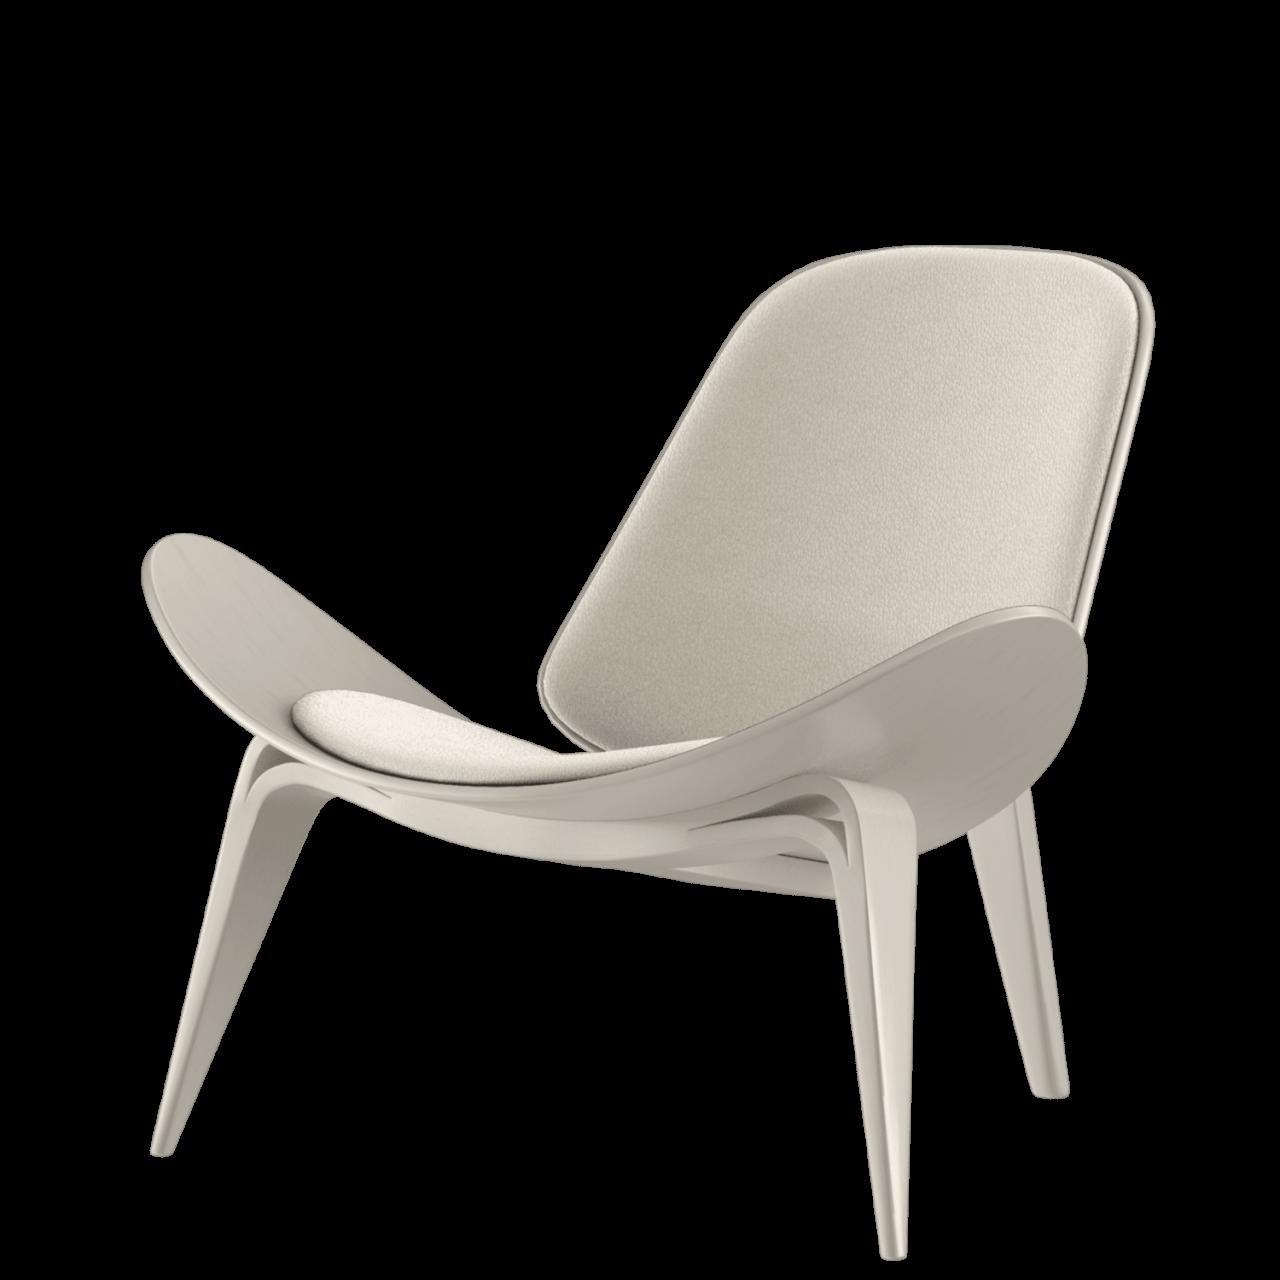 CH07 Sessel farbig